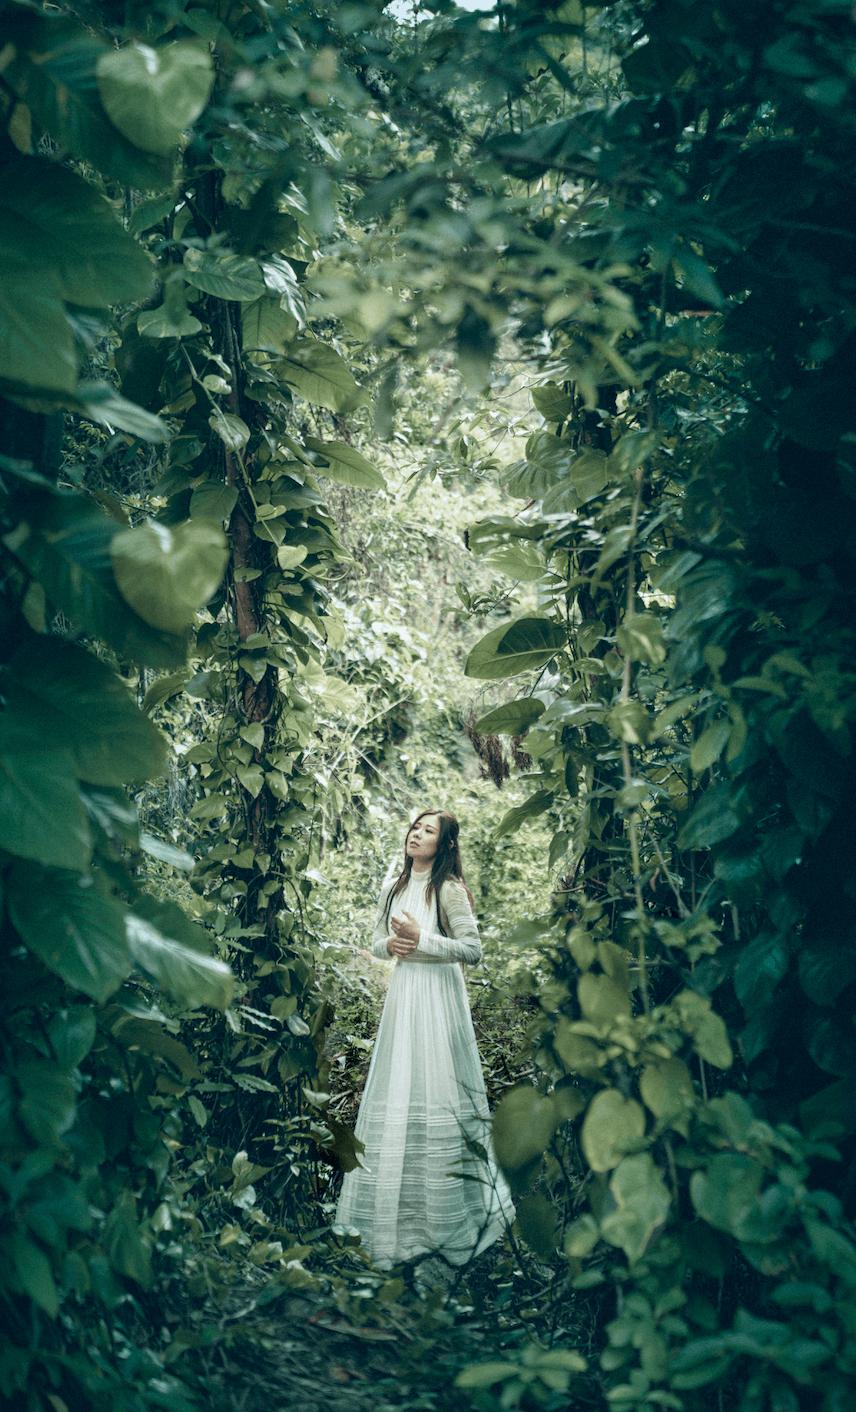 Robynn帶着腹中BB遠入森林拍MV。